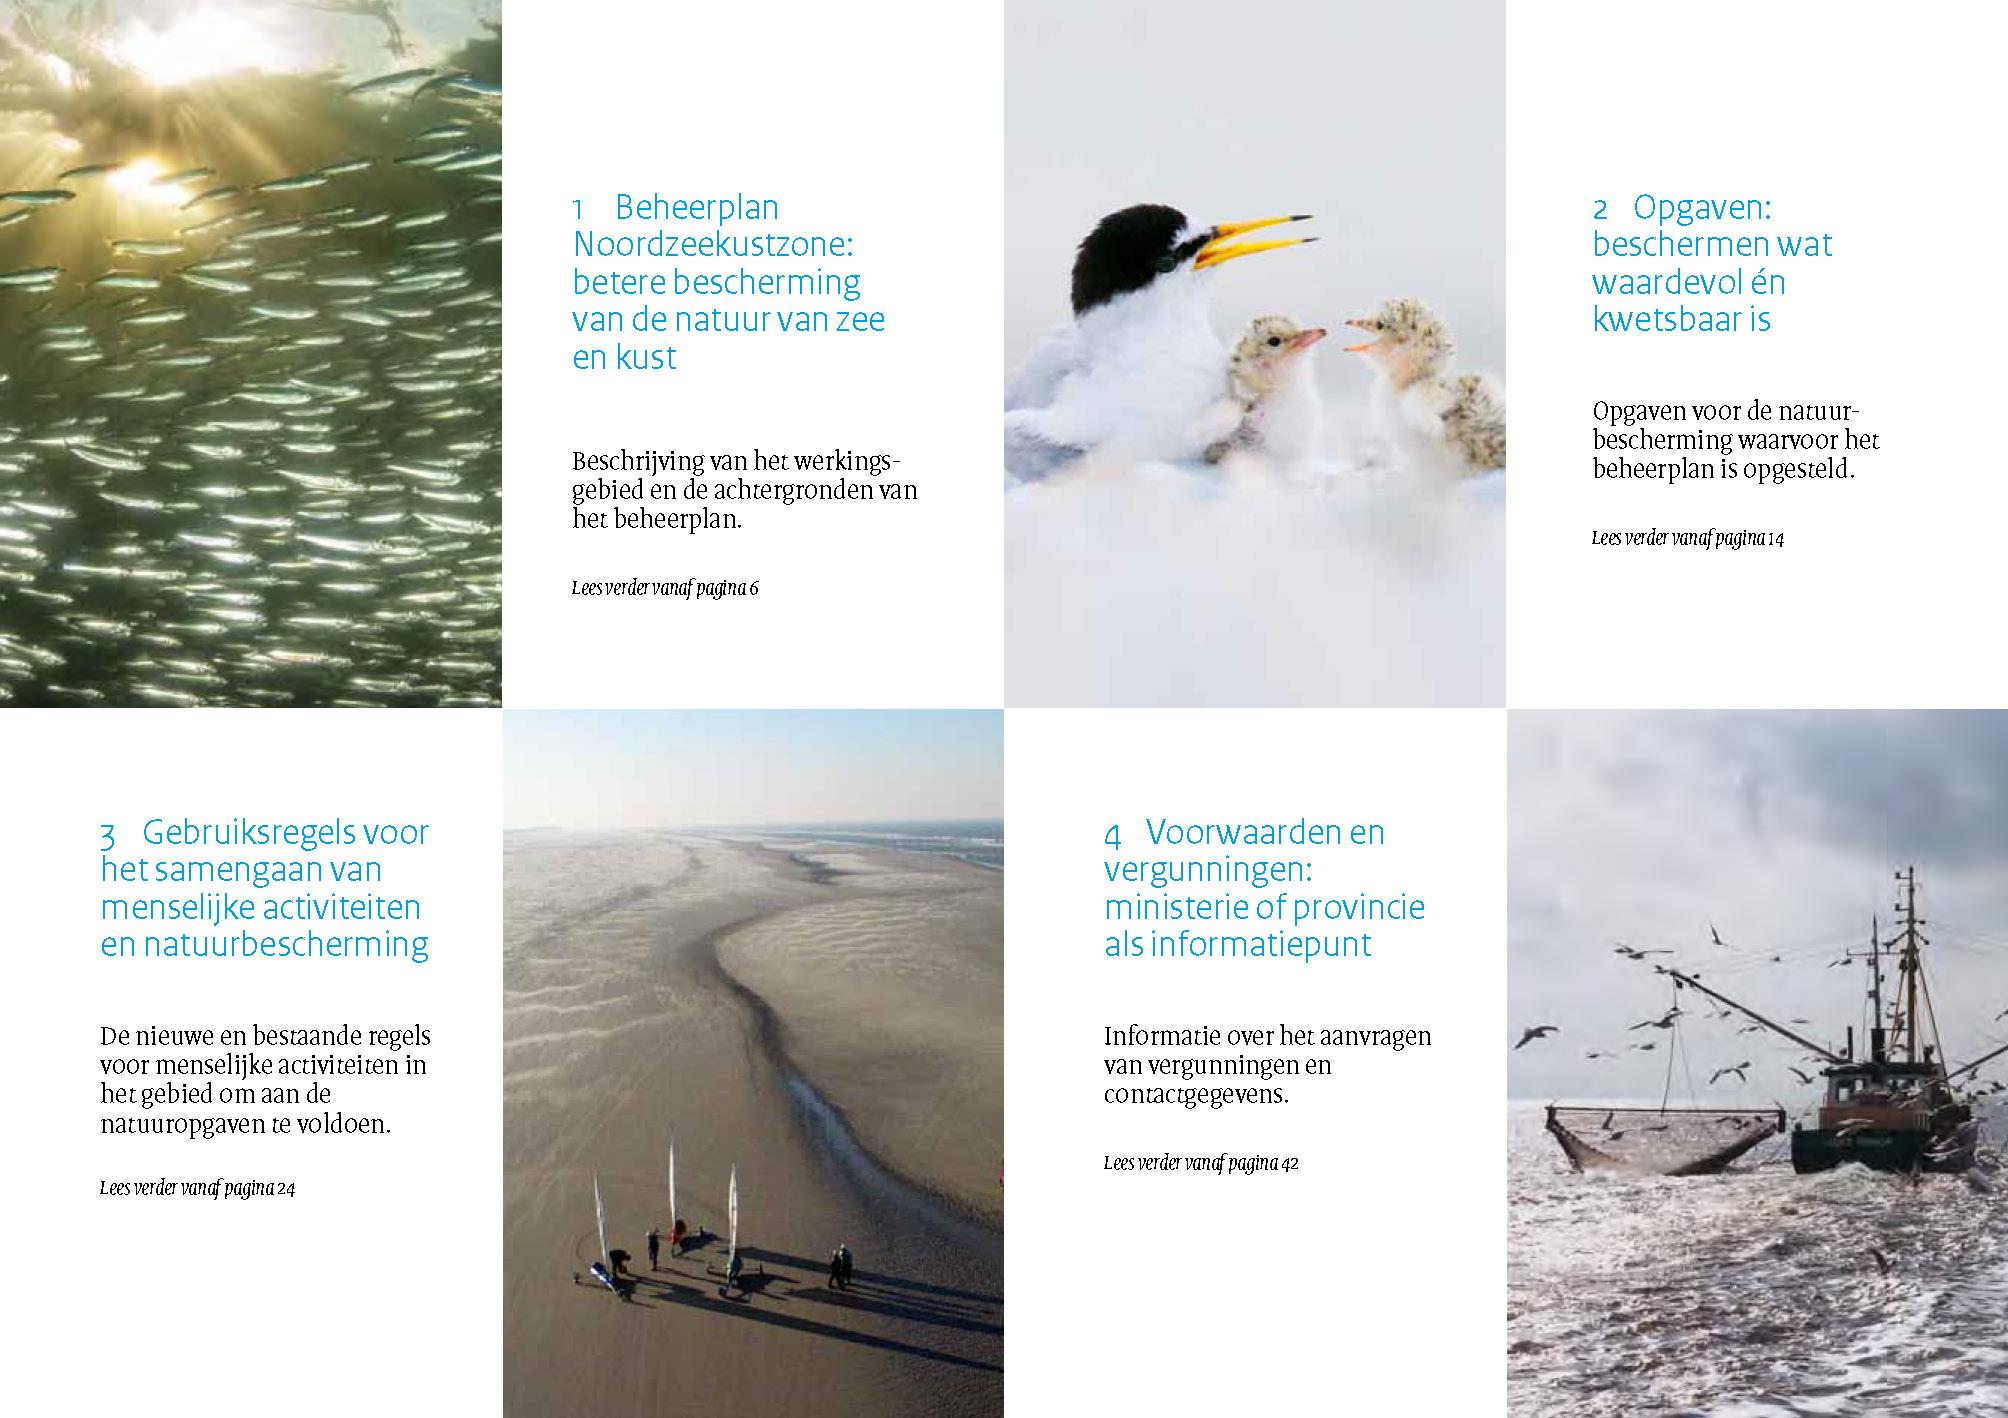 Noordzeekustzone inhoud